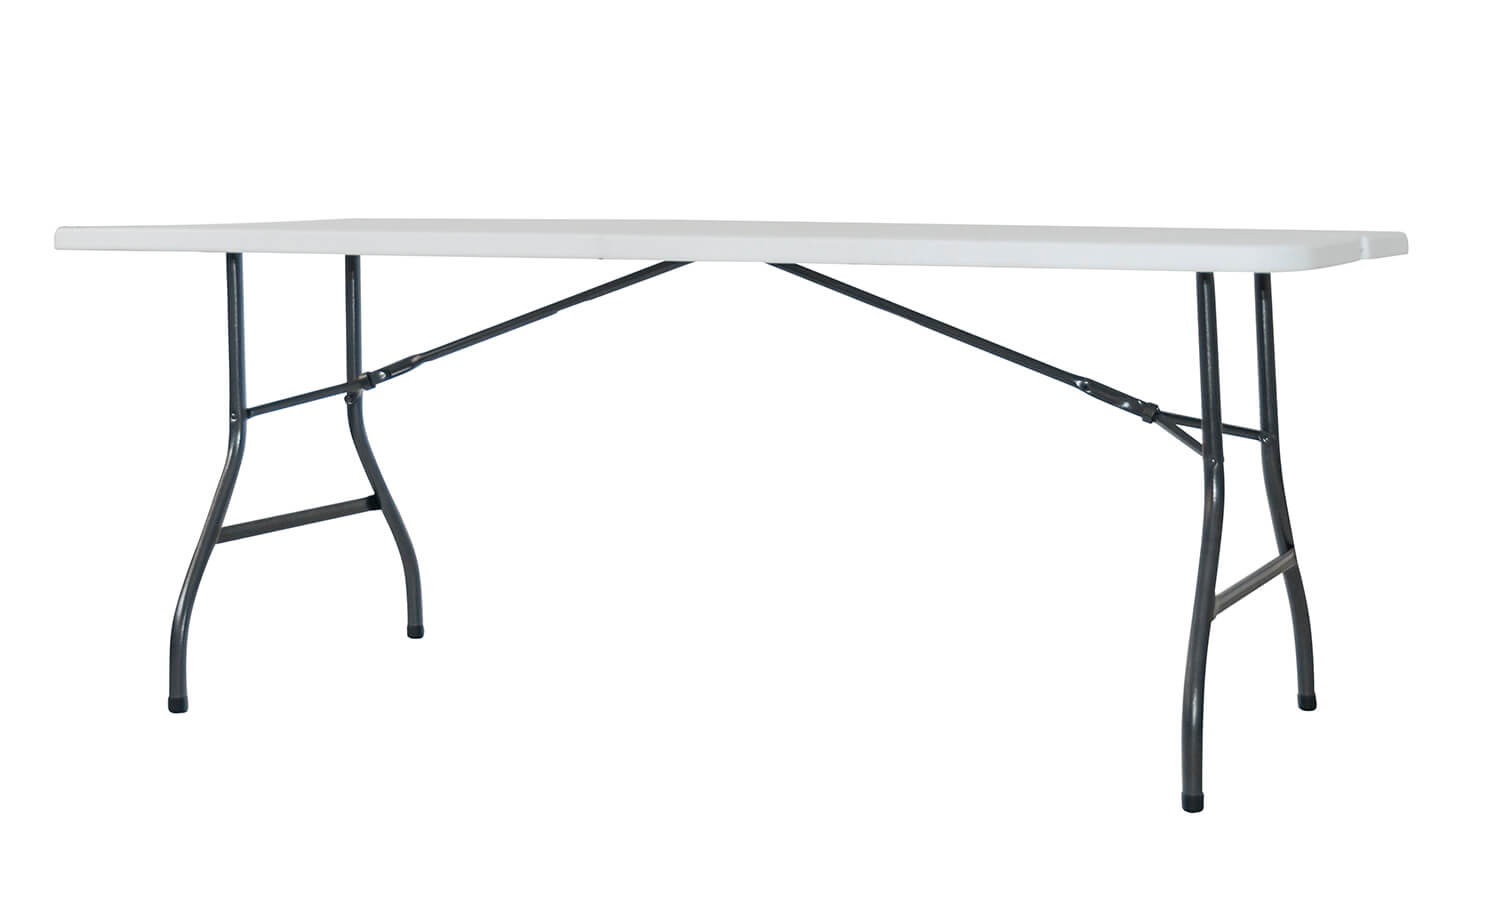 Newstorm Steel Table Folding Type Suitcase Oskar180 + White-4999100100235L